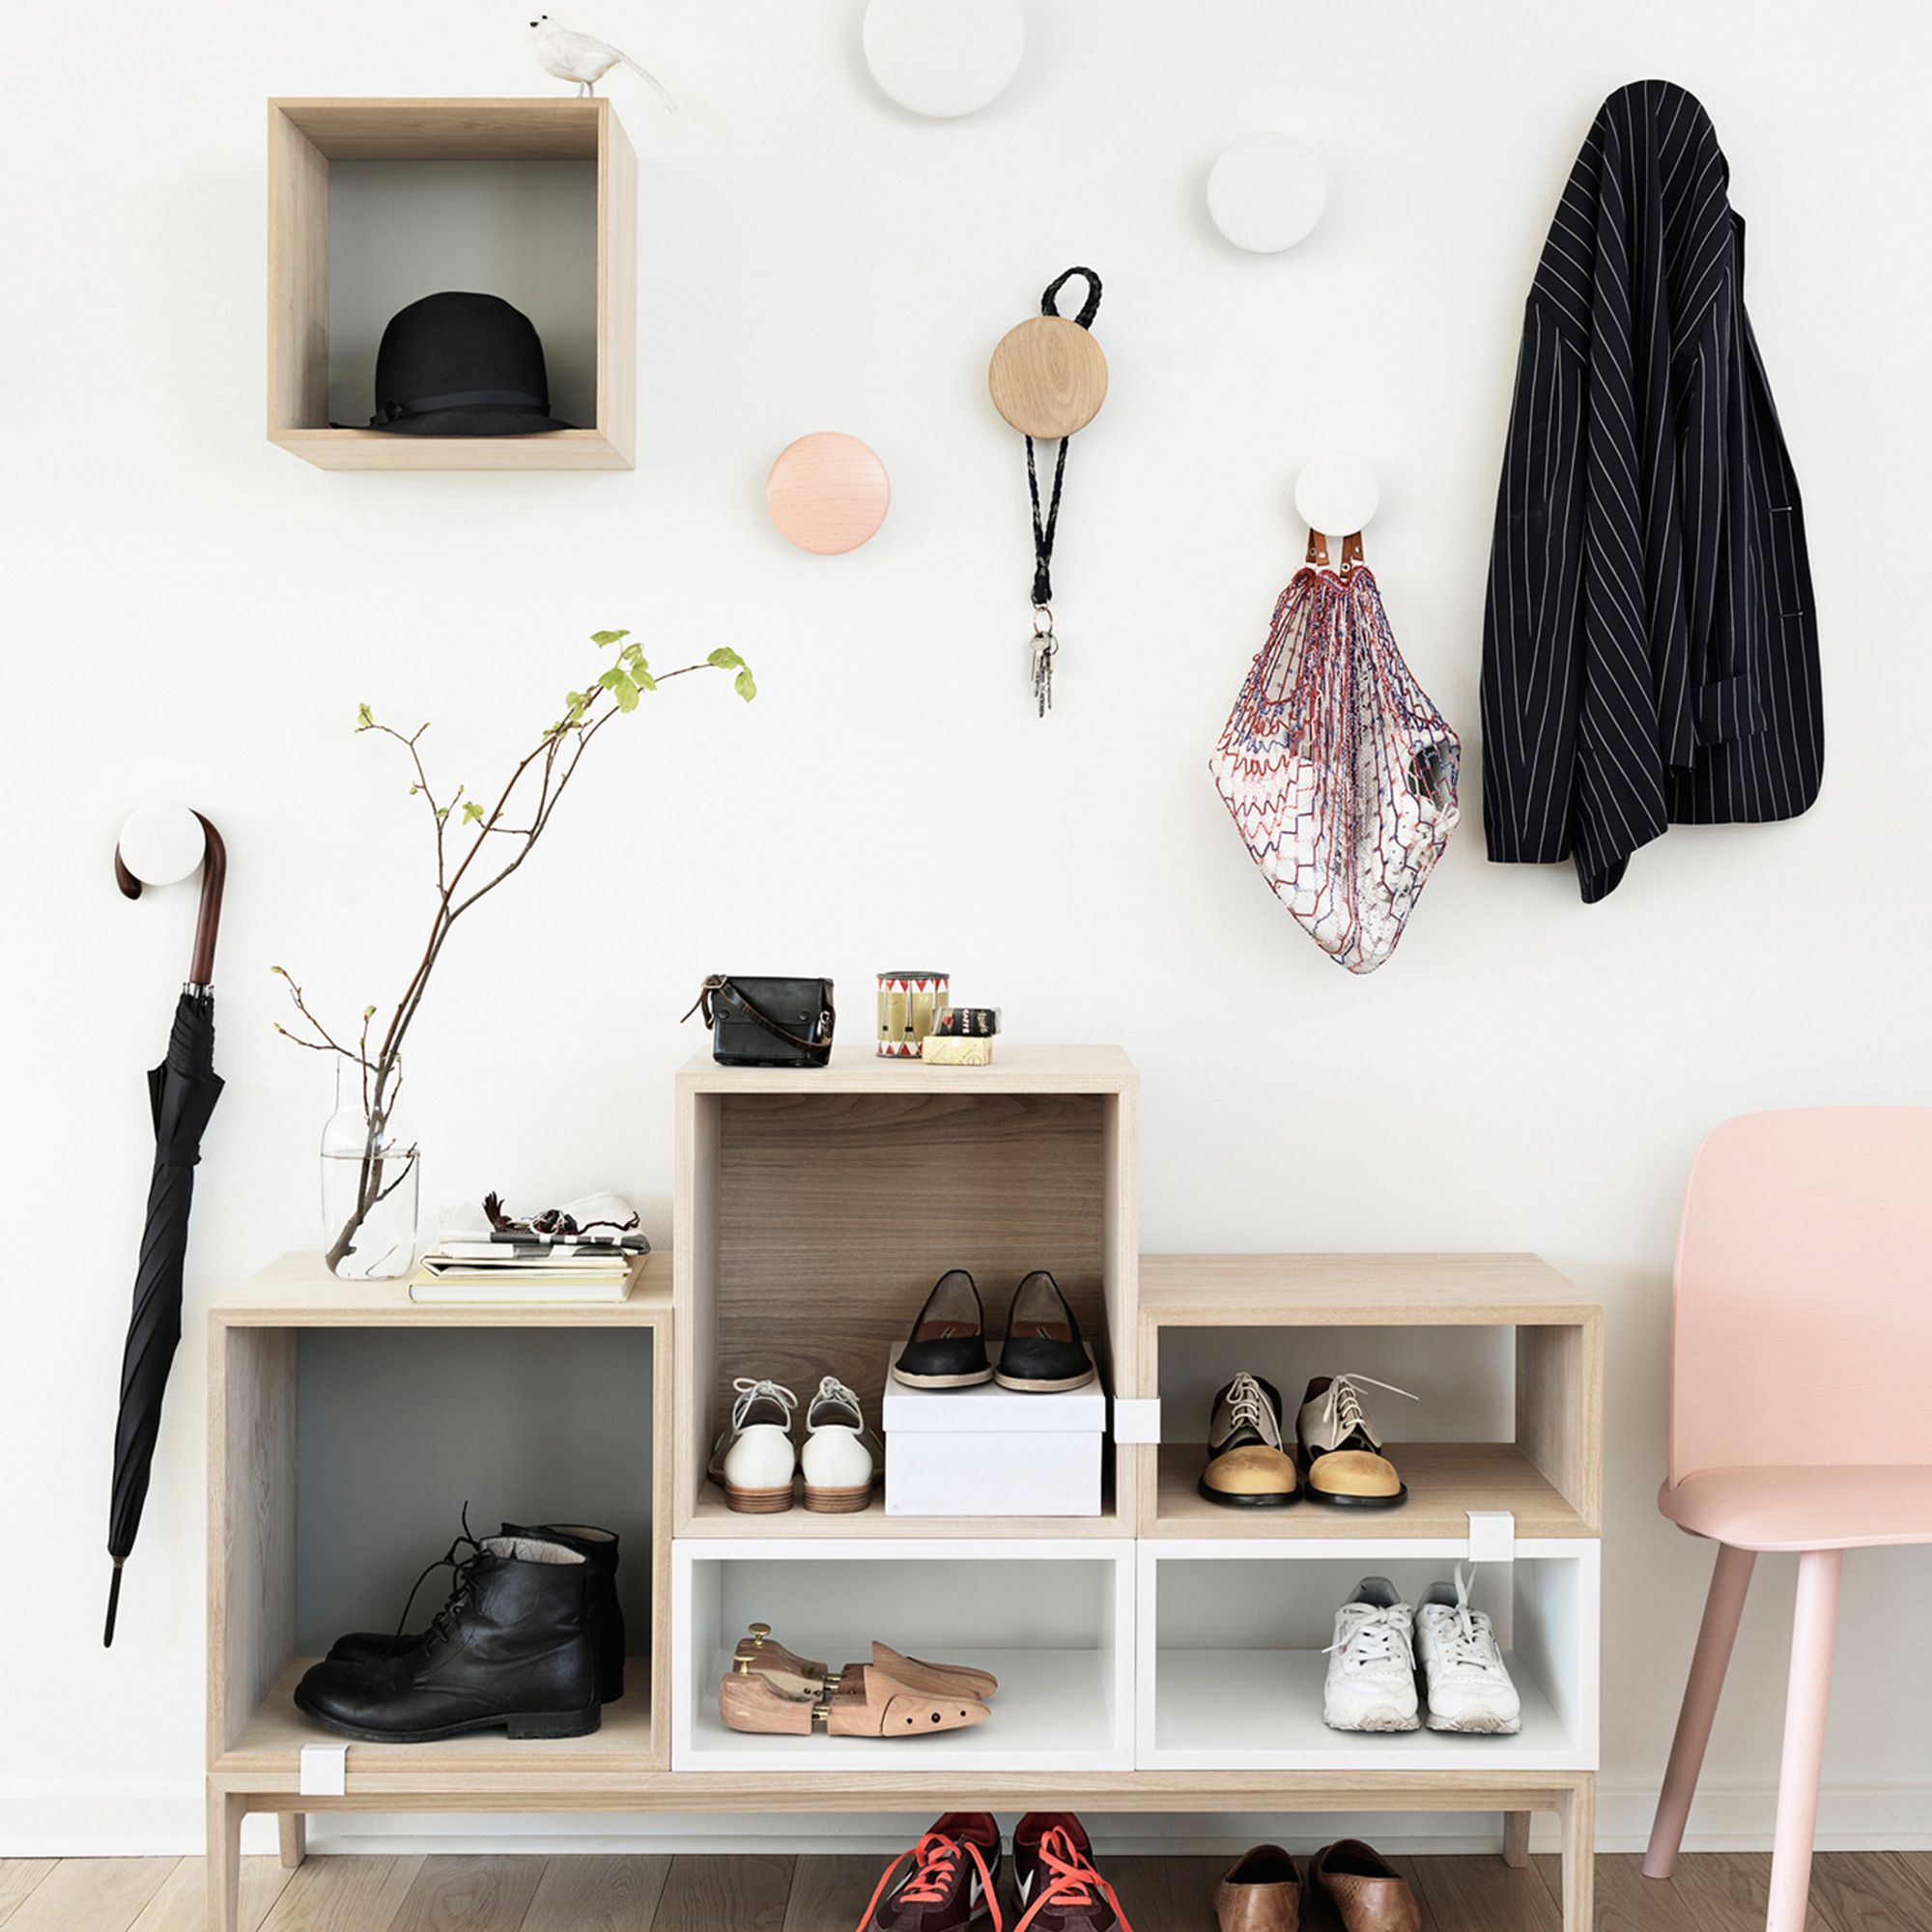 Foto de www.lovethesign.com - Recibidores muebles